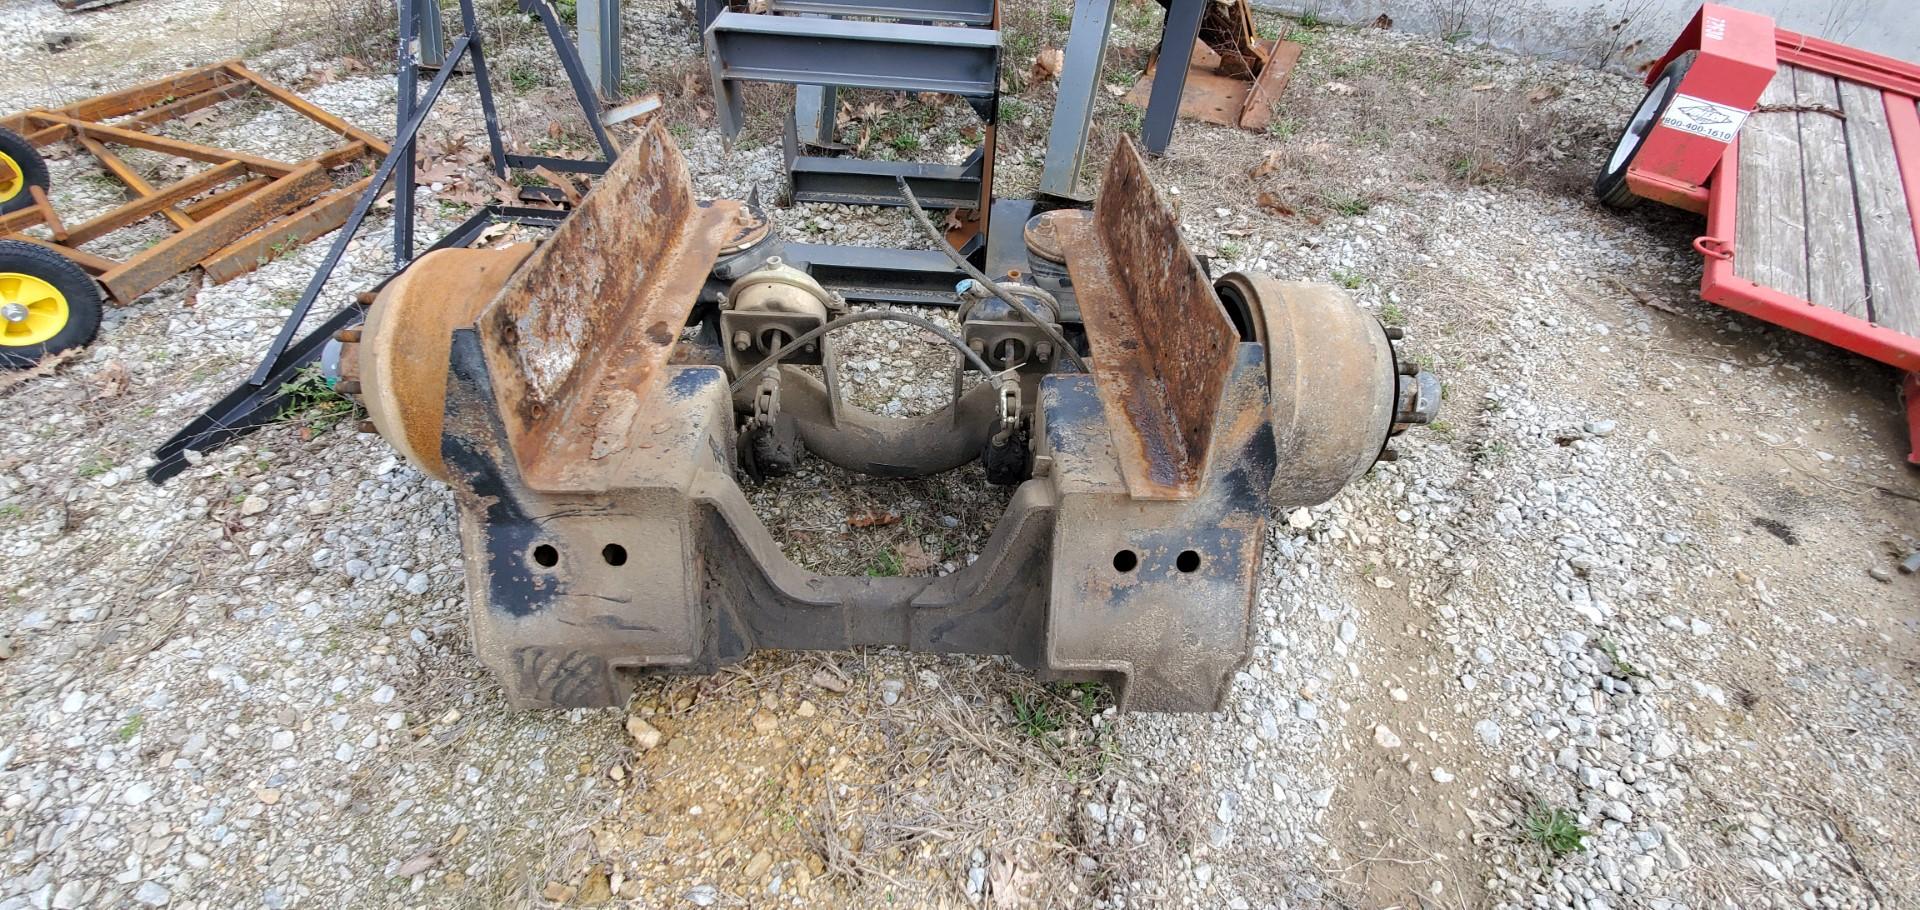 Dump Truck Lift Axle - Image 3 of 4